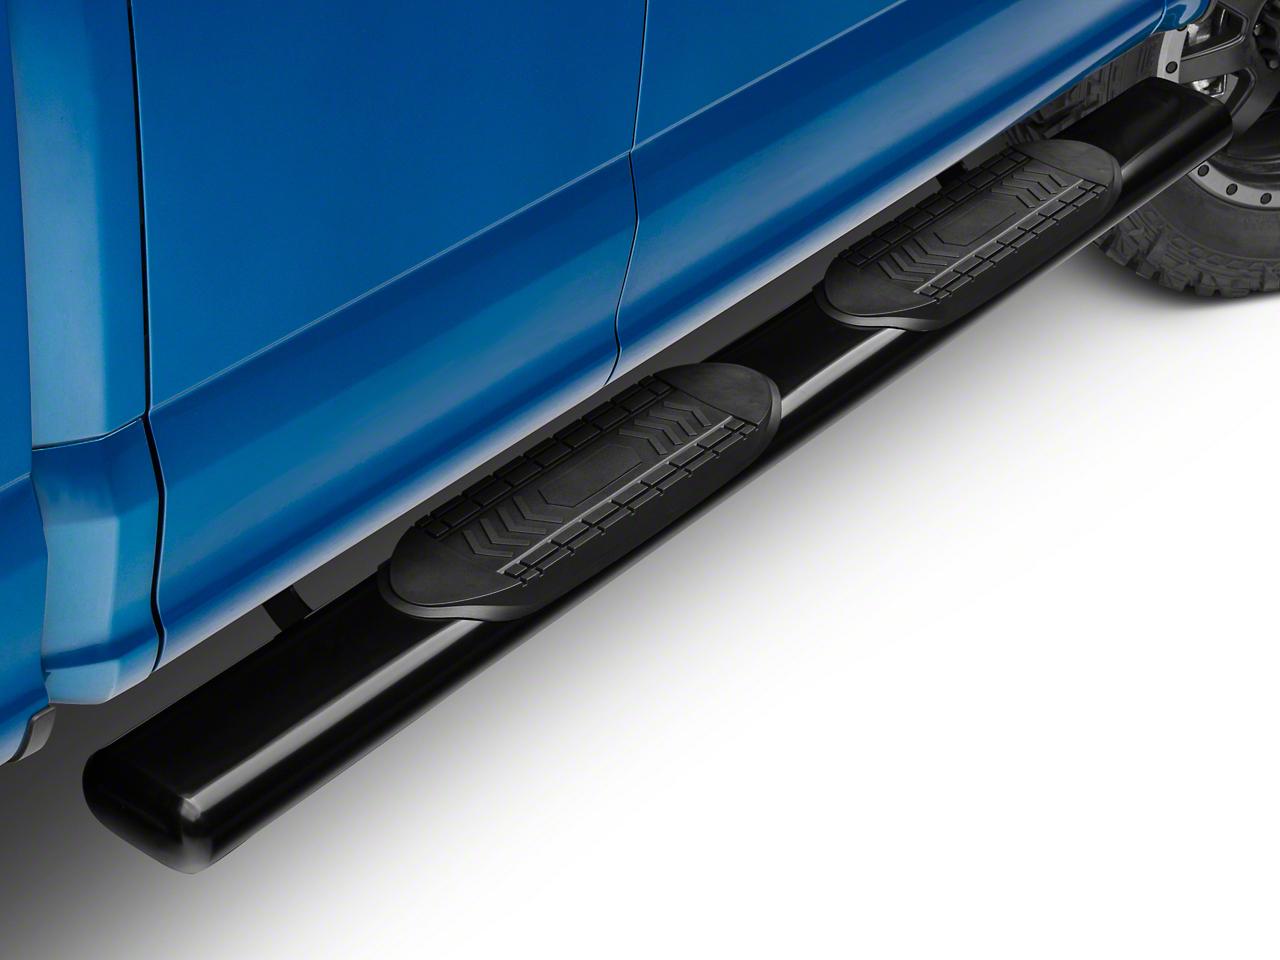 Barricade 6 in. Oval Straight Side Step Bars - Black (15-19 F-150 Regular Cab, SuperCab)